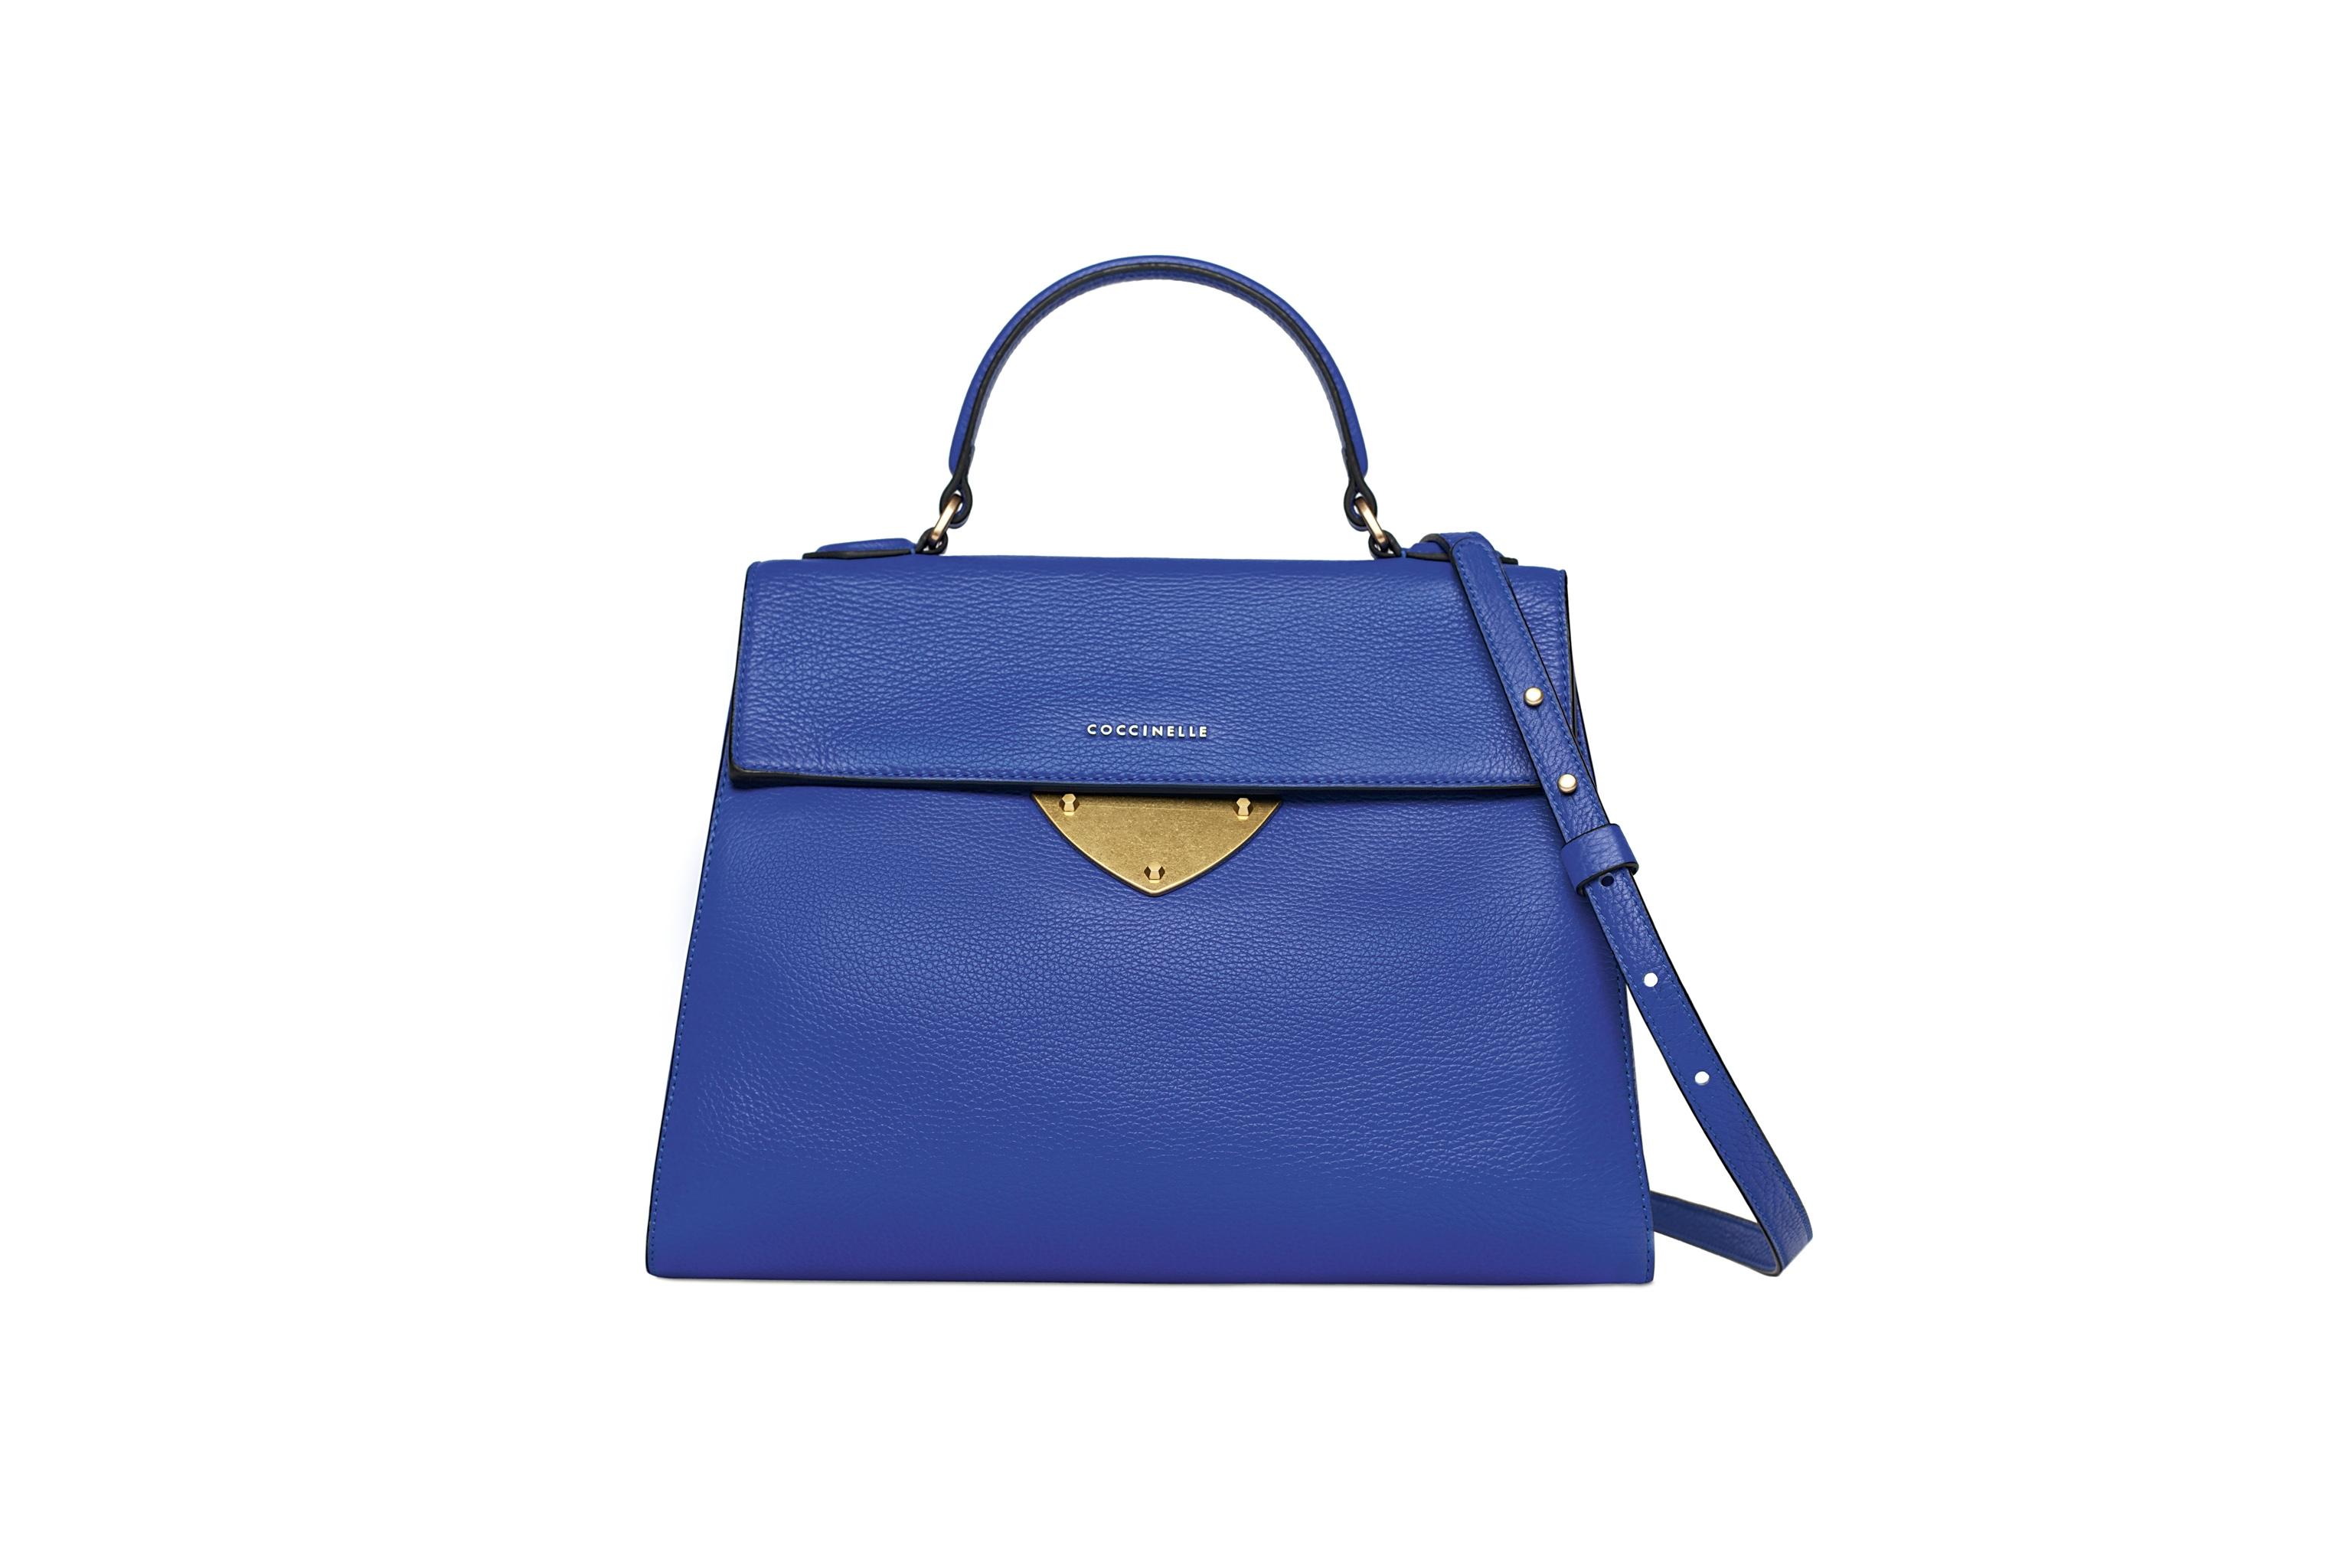 Spring Summer 2015 Bags Bag Spring Summer 2015